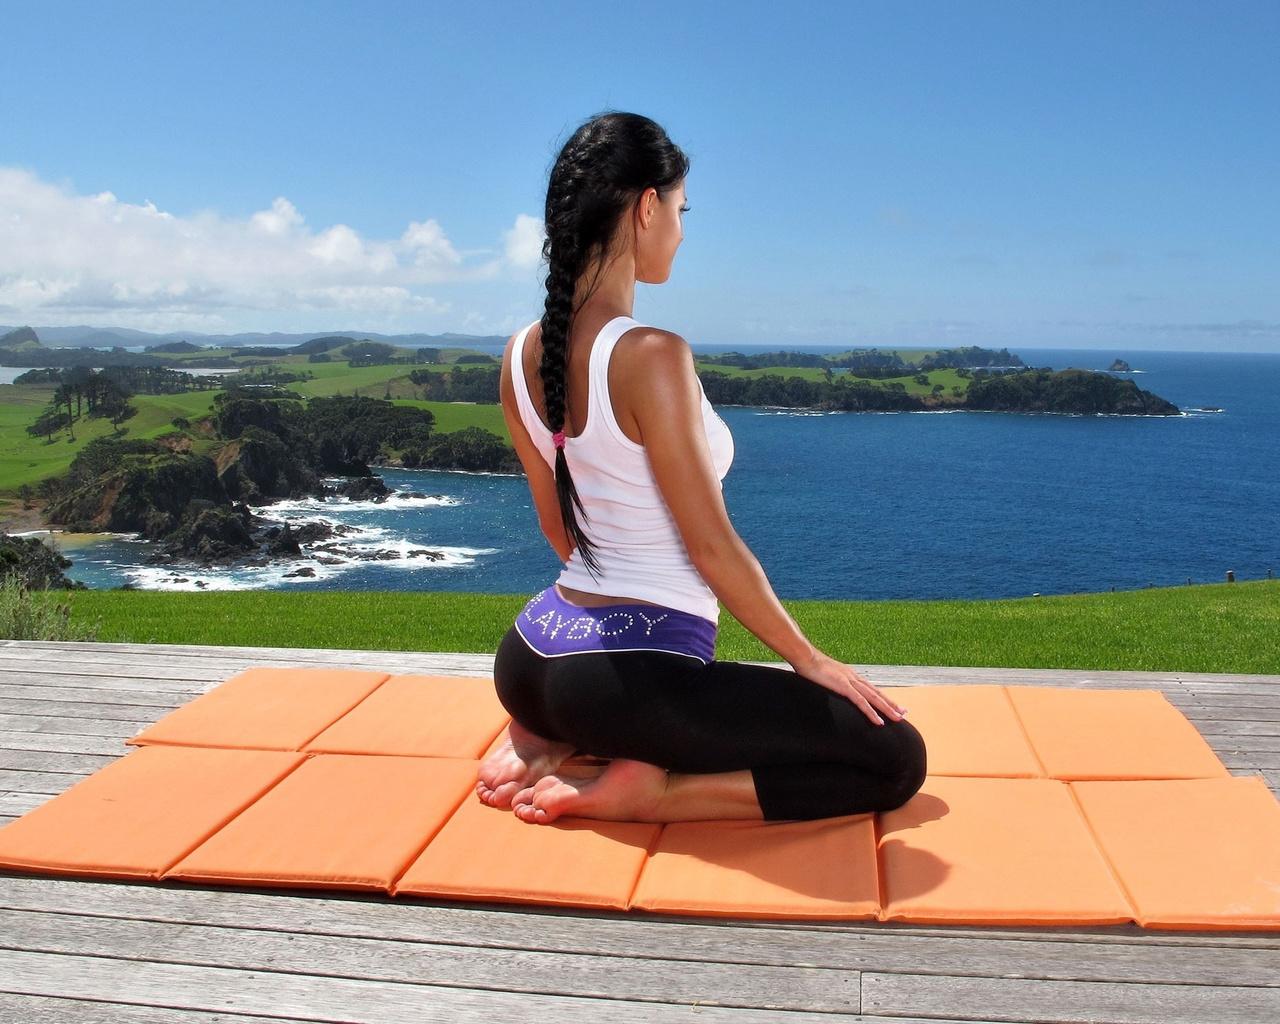 ho helped bring yoga - HD1280×1024